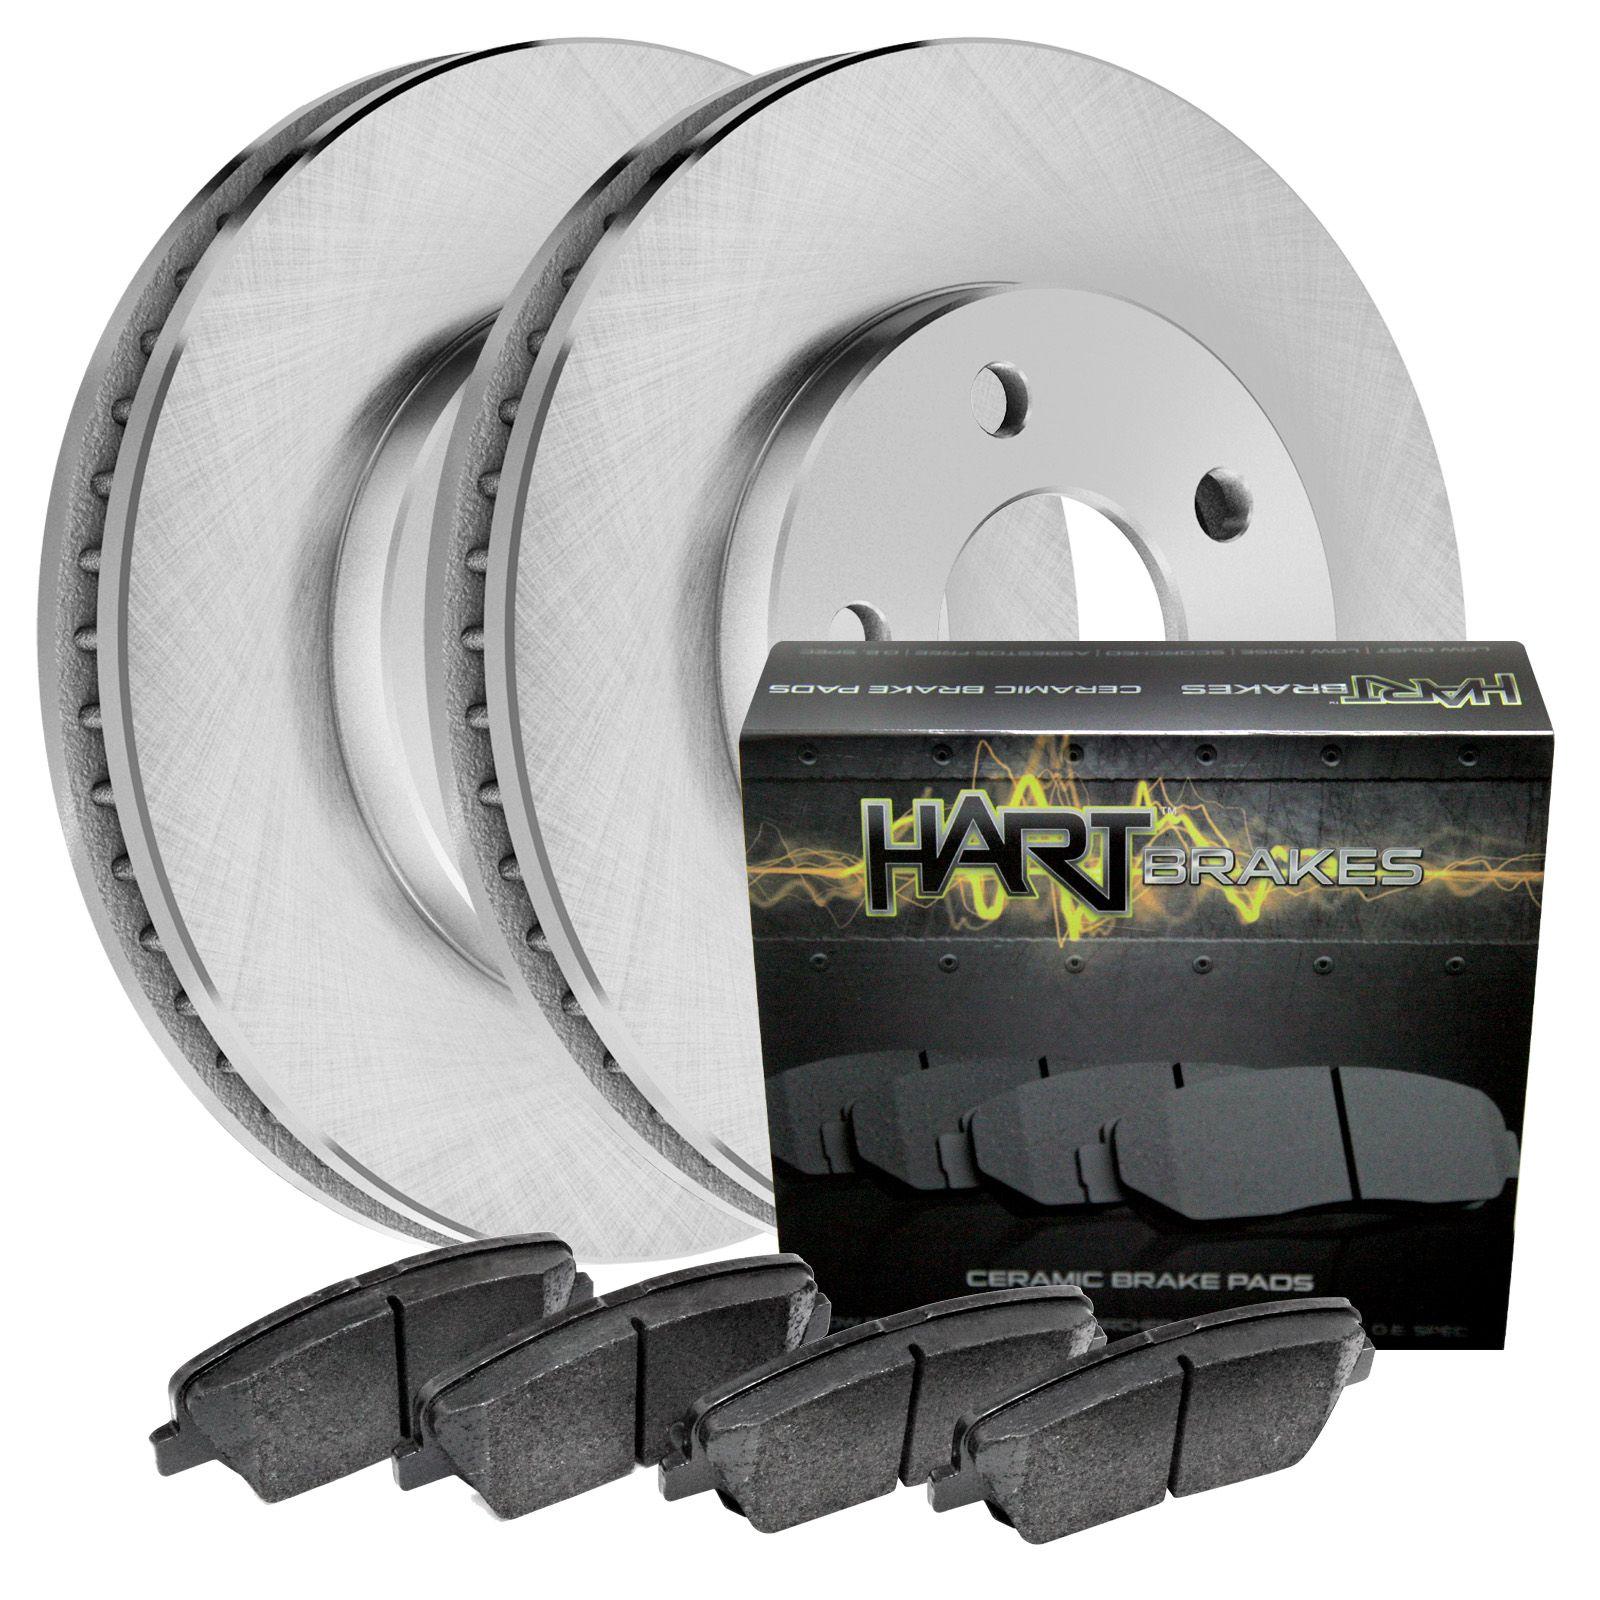 For 1997-2004 Mitsubishi Diamante Hart Brakes Front Rear Ceramic Brake Pads